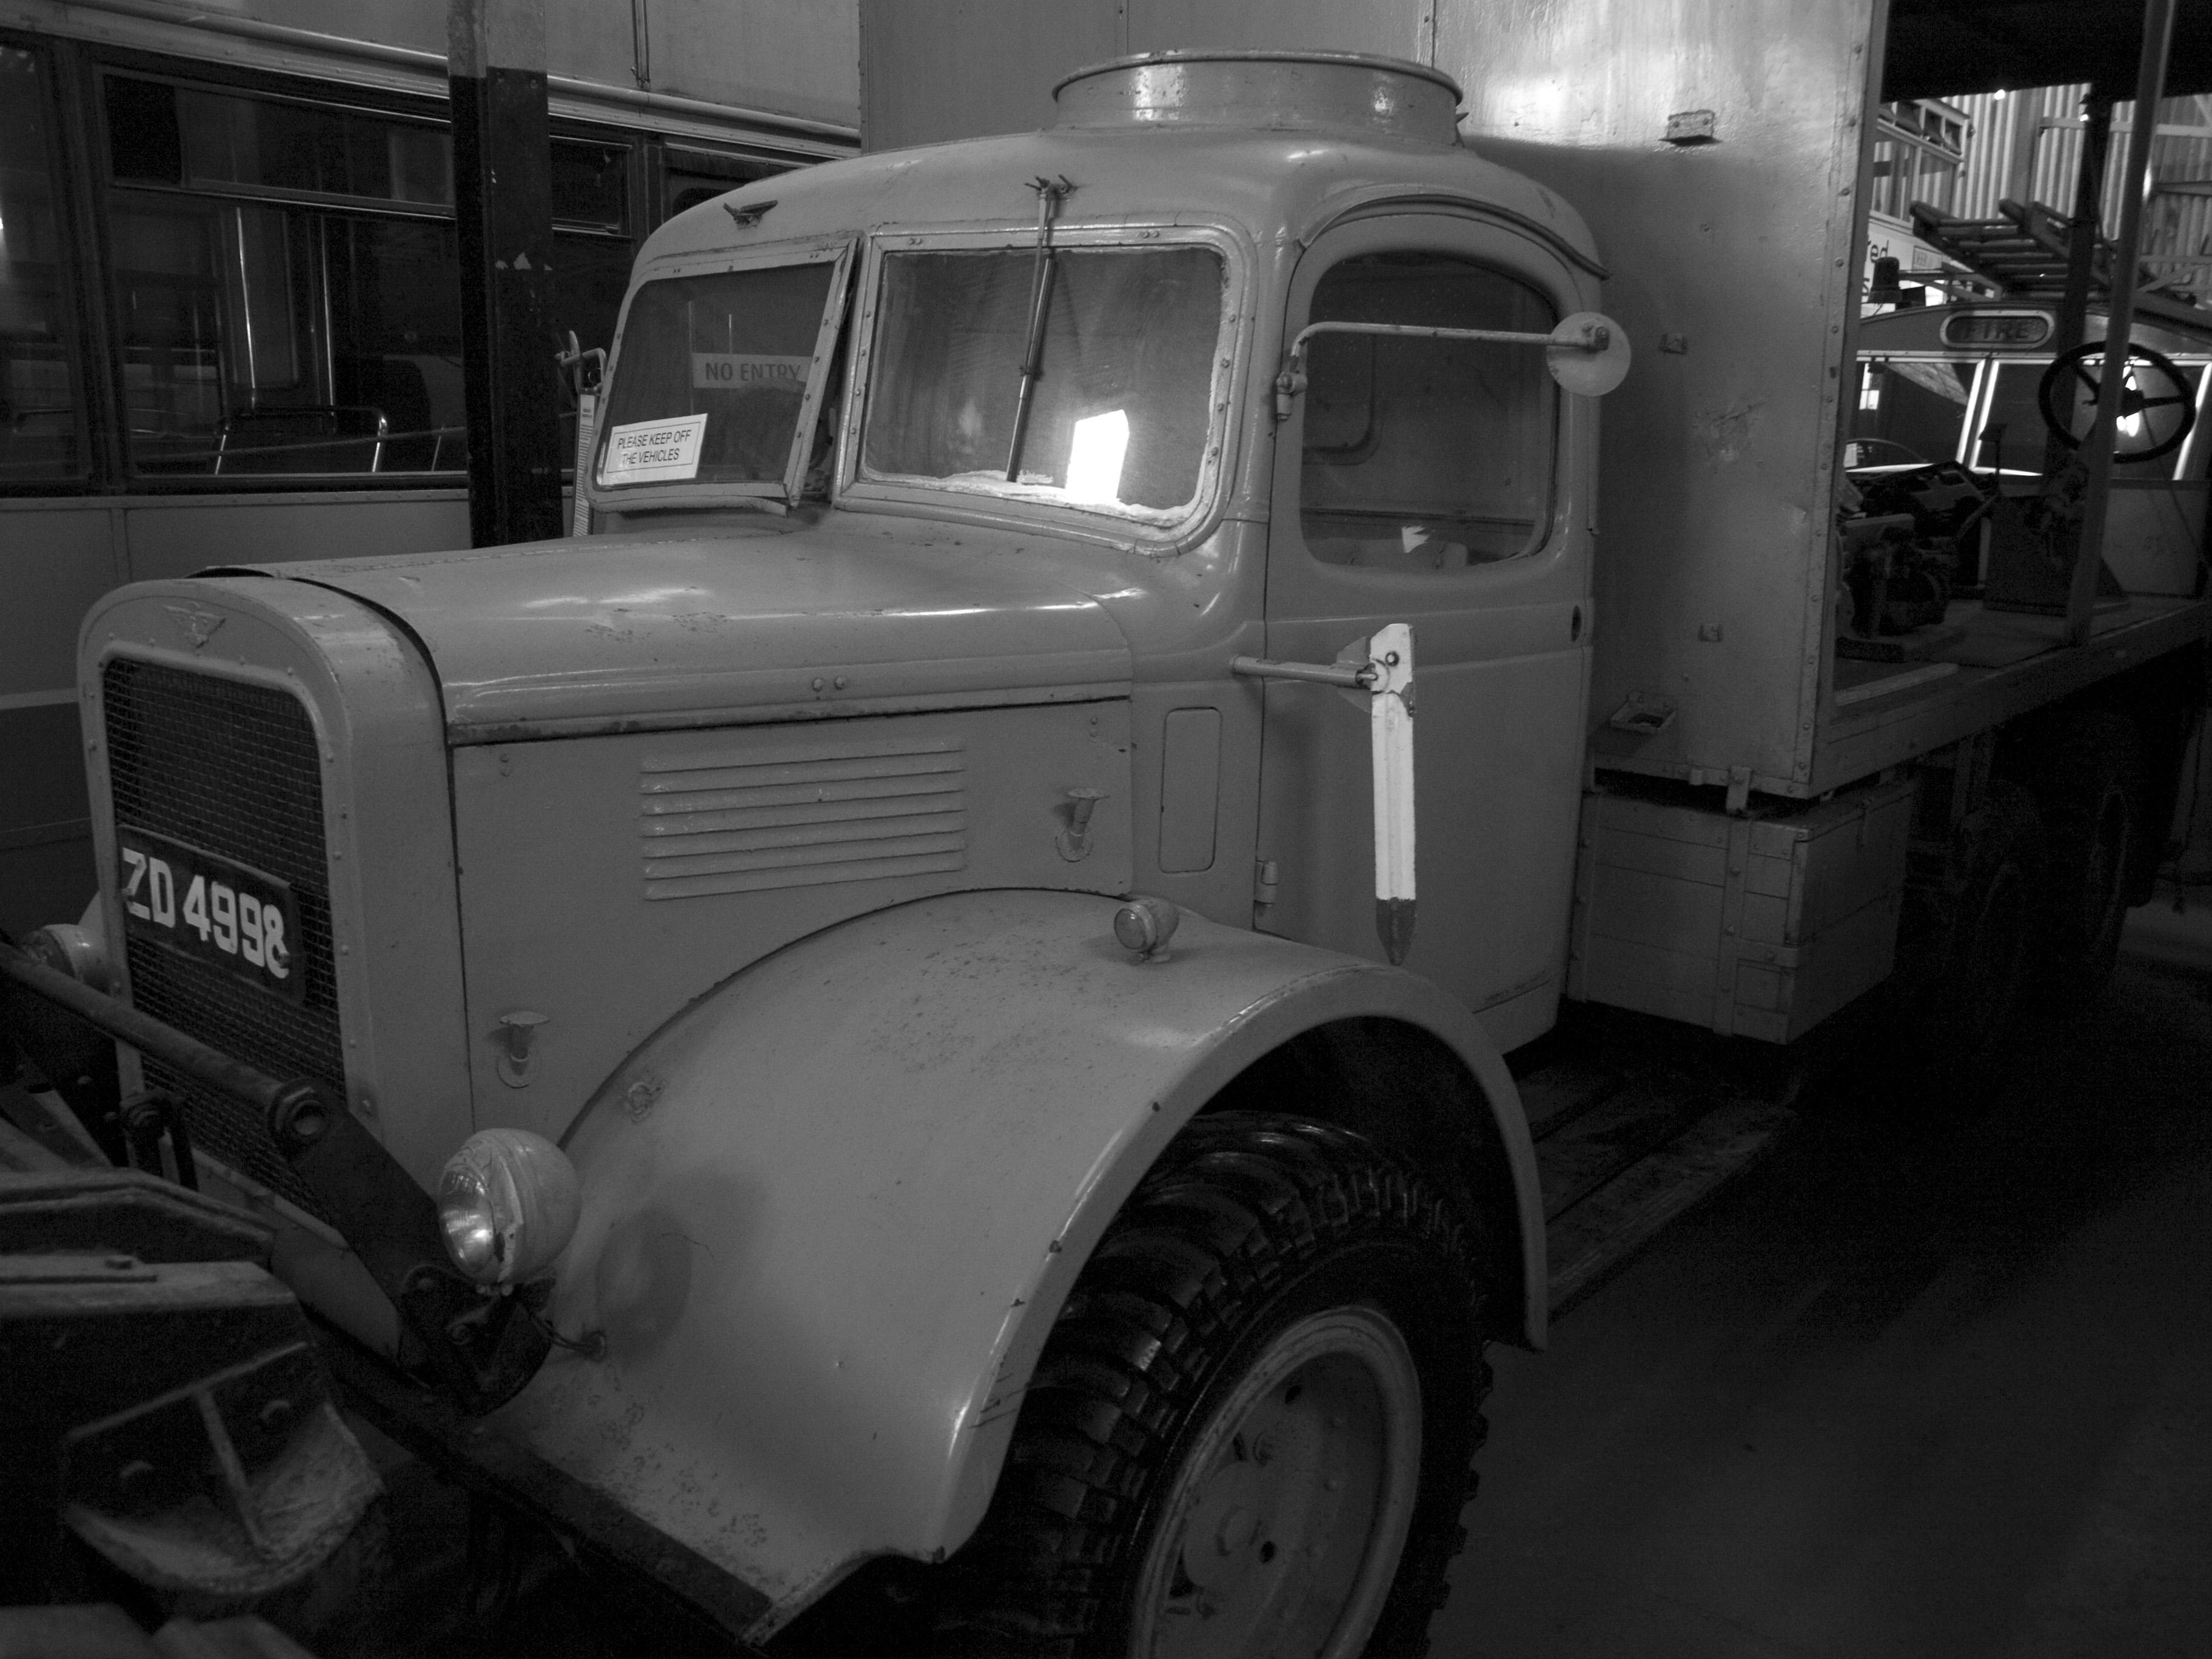 National transport museum photo